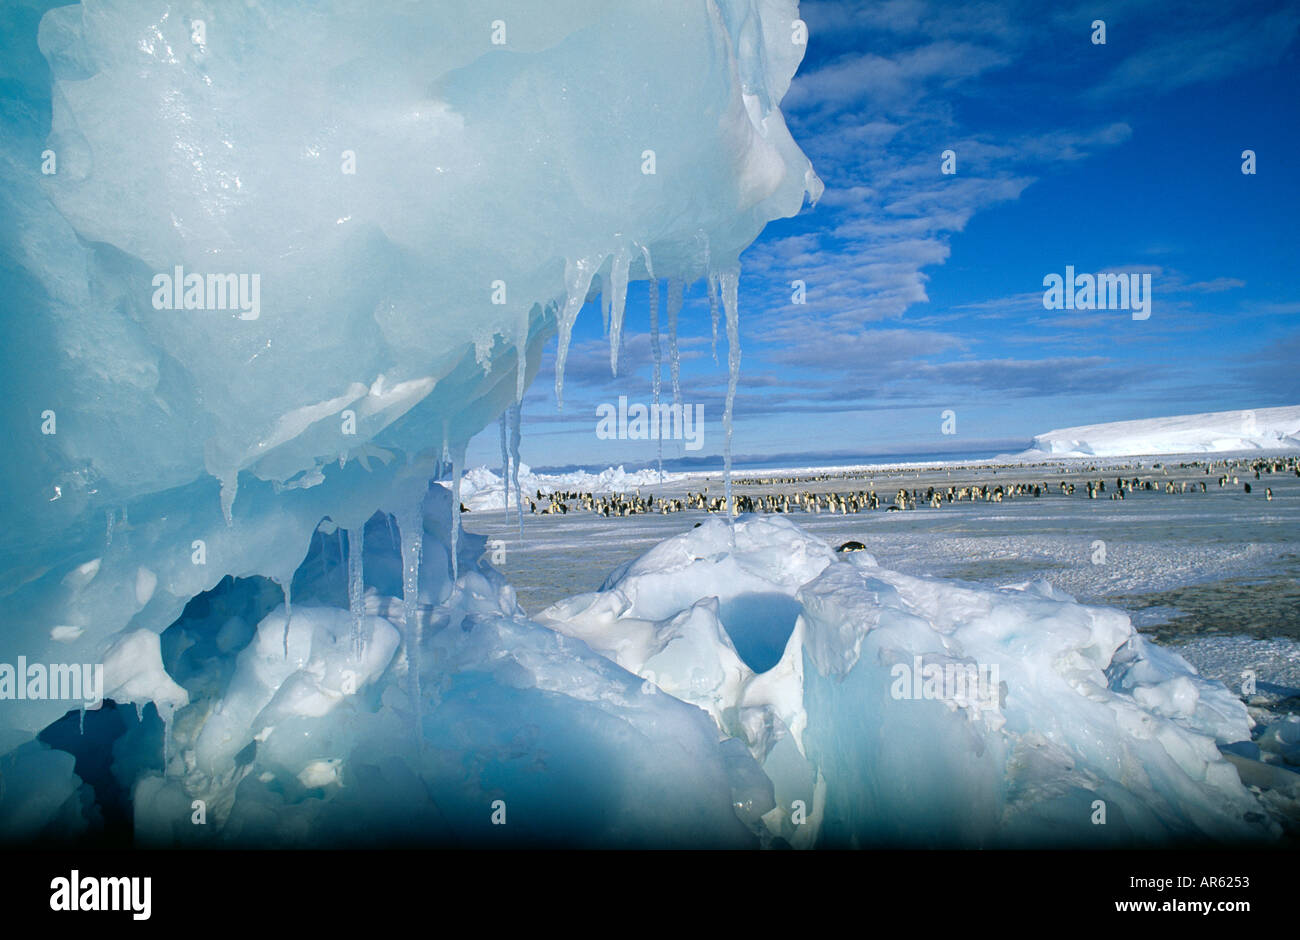 Emperor Penguin colony Aptenodytes forsteri chicks in creche at colony on Dawson Lambton Glacier Weddell Sea Antarctica November - Stock Image